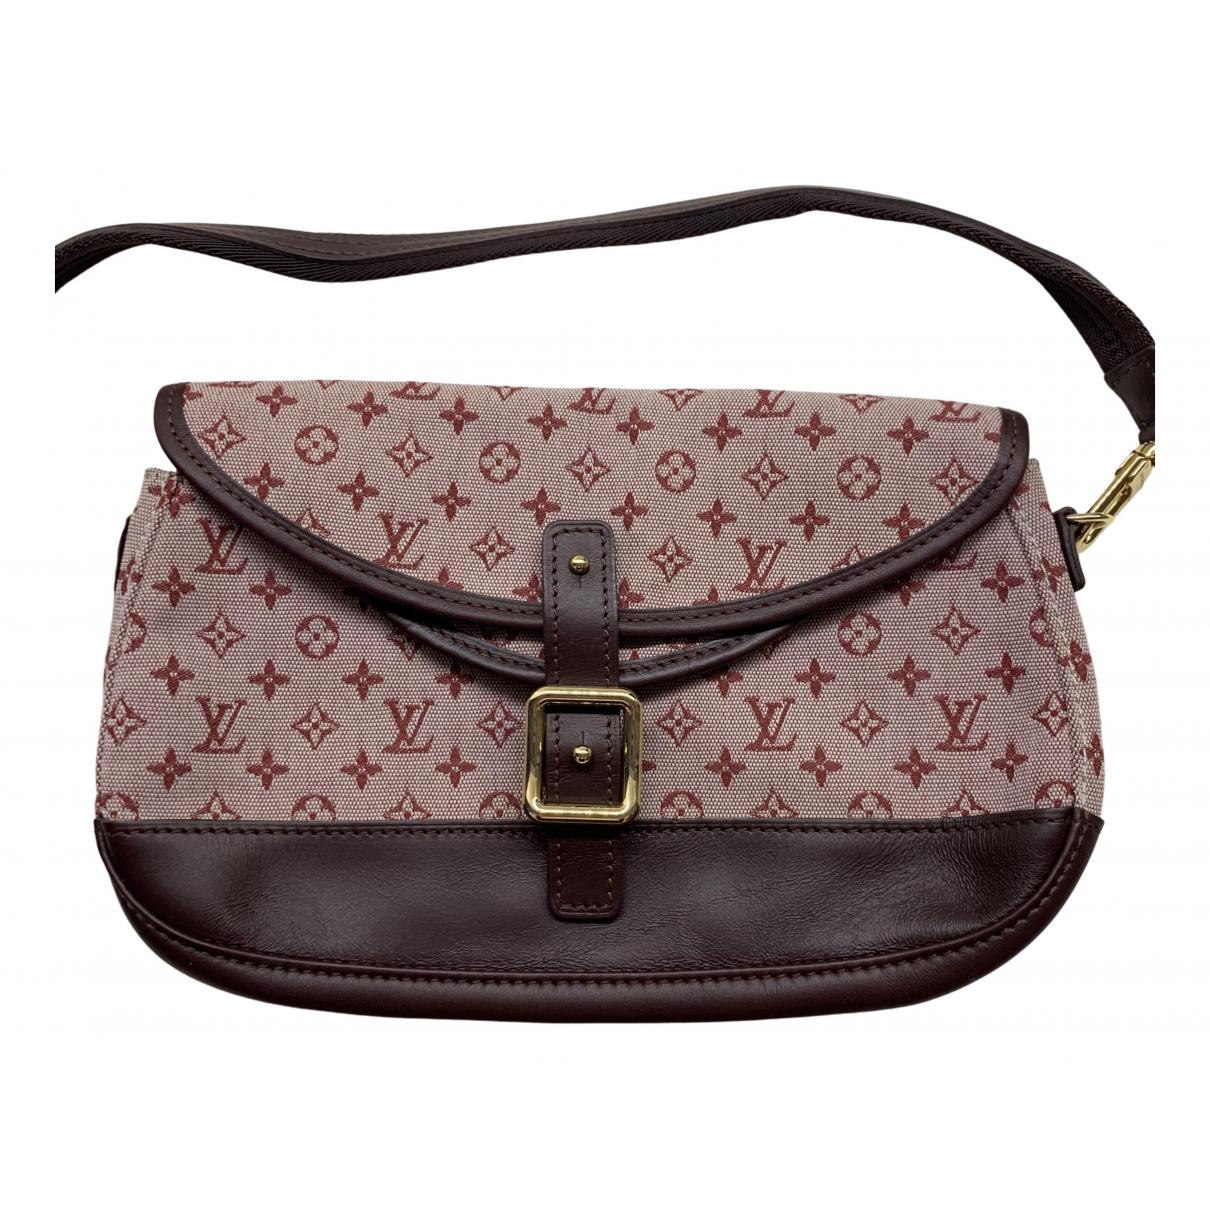 Louis Vuitton \N Red Cotton handbag for Women \N